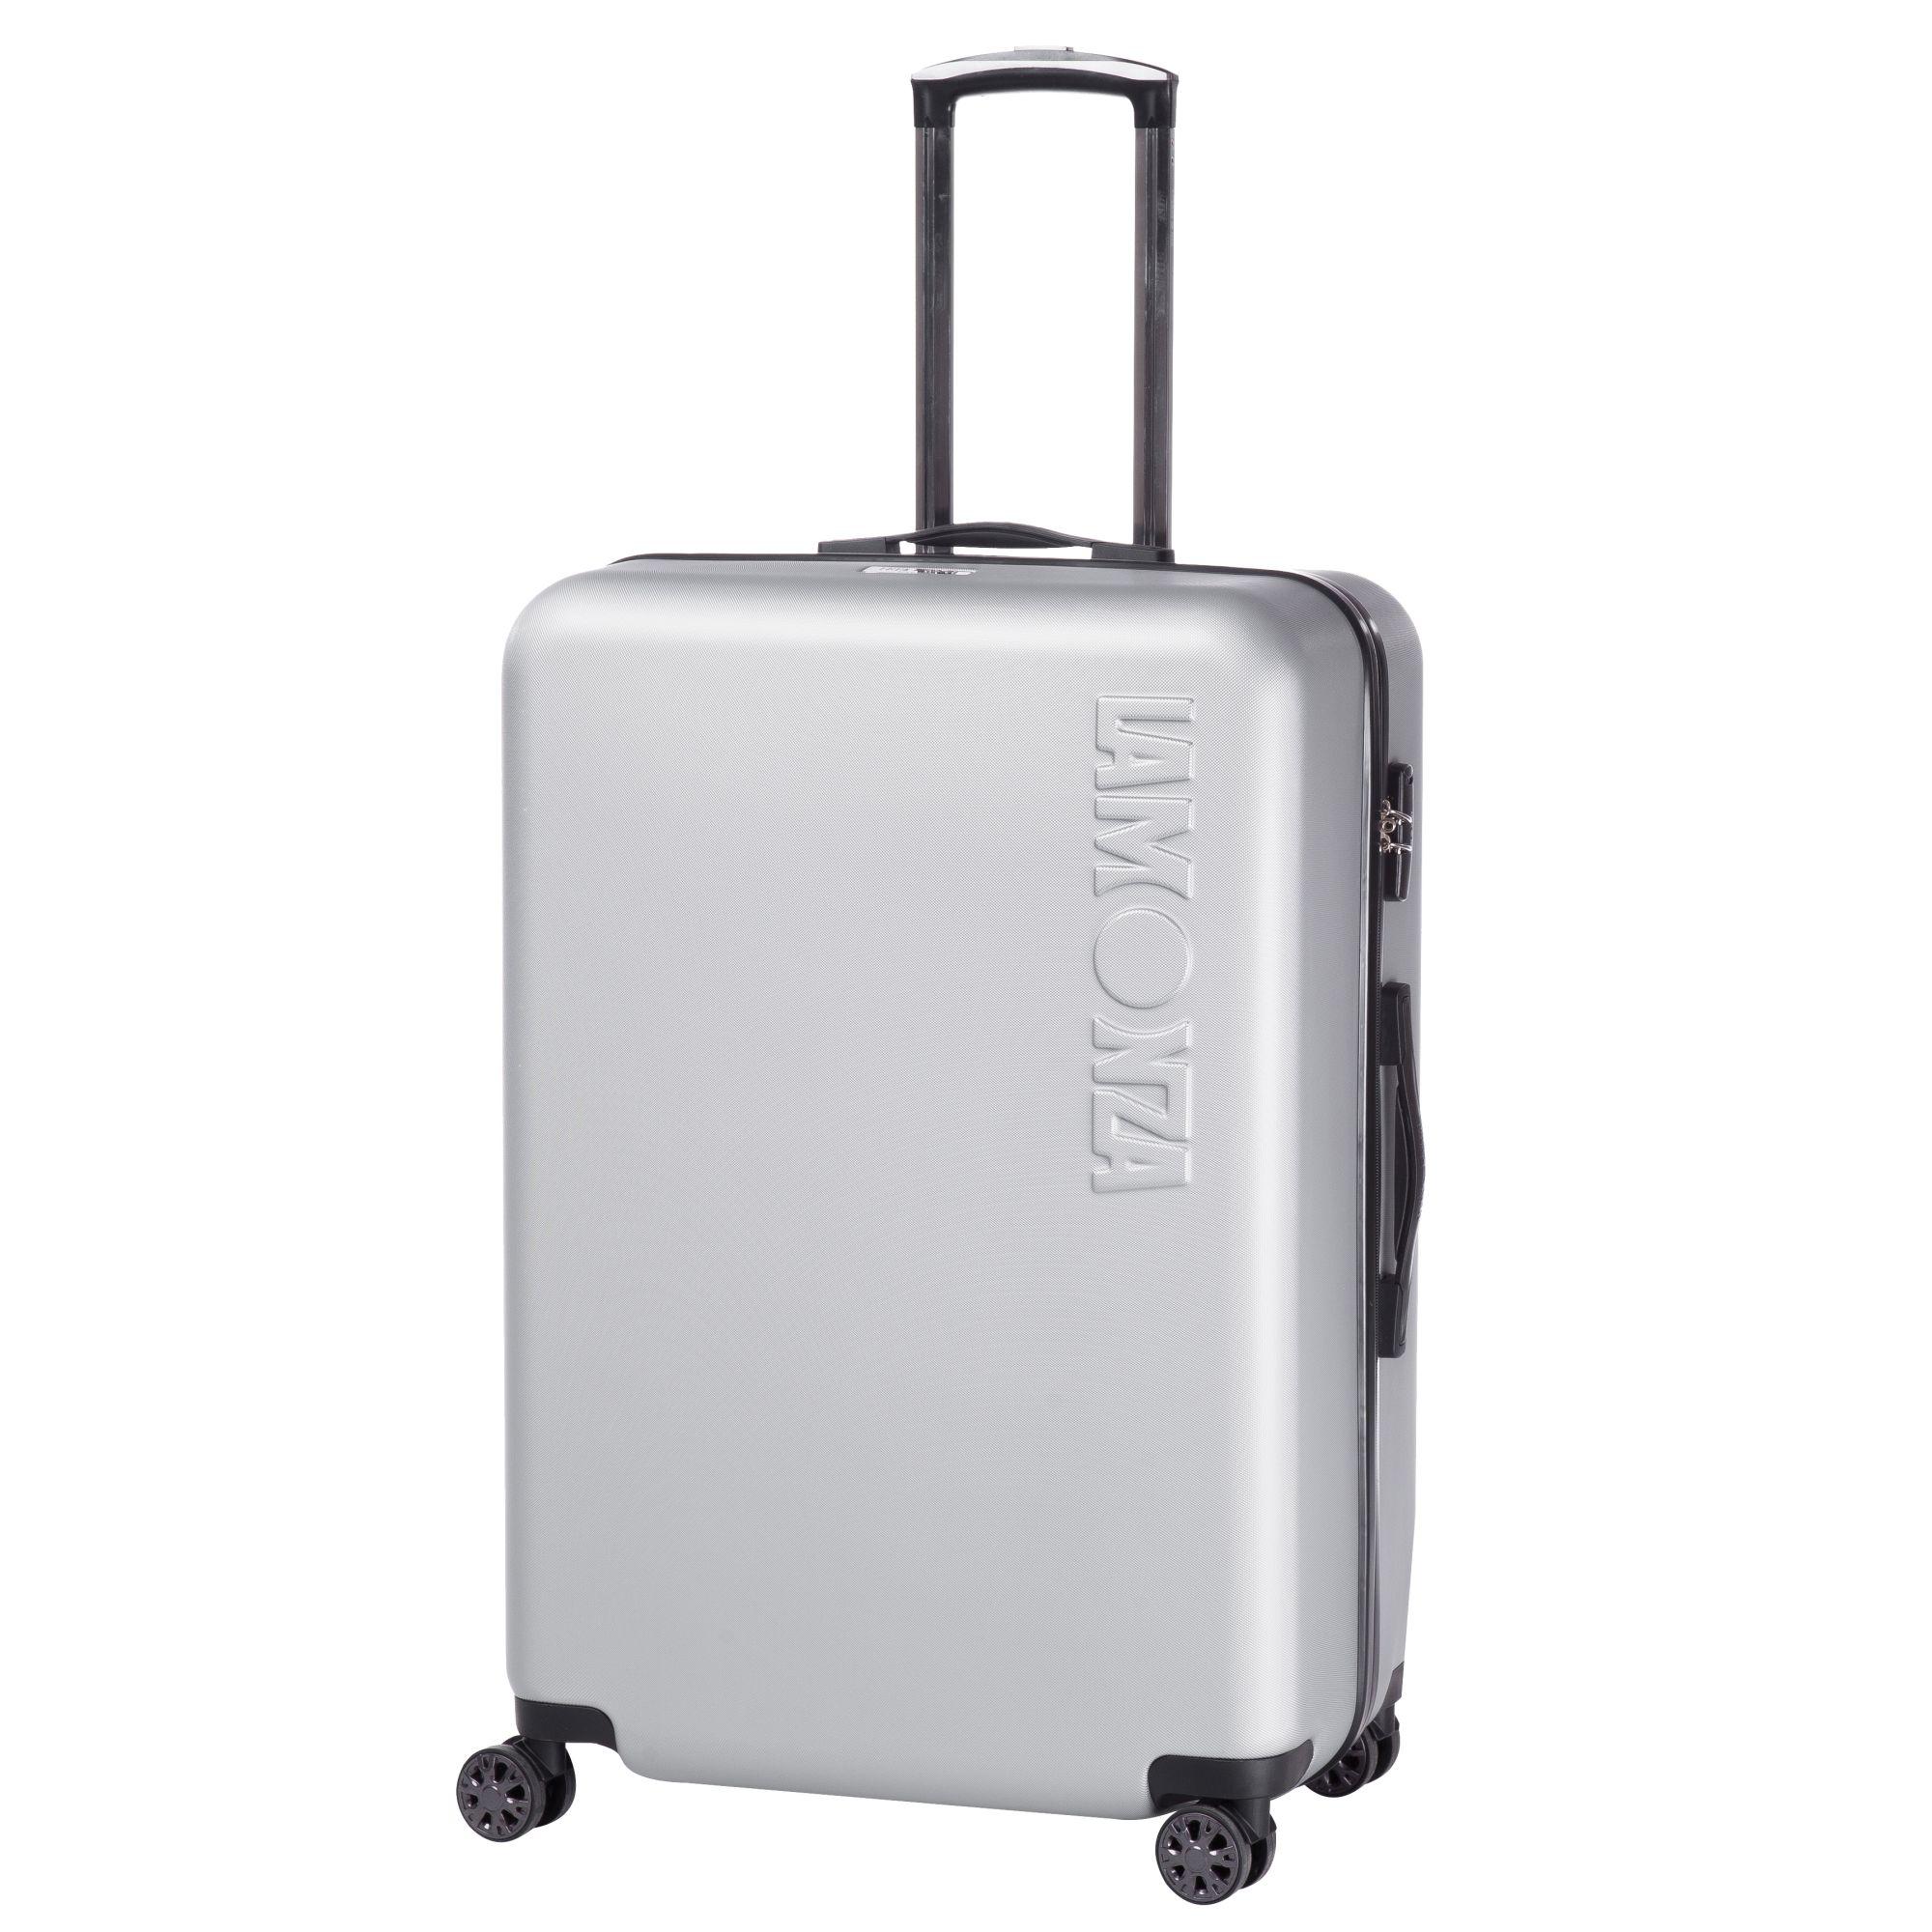 Troler Steelcase 75x50x31 cm, 4 kg, argintiu